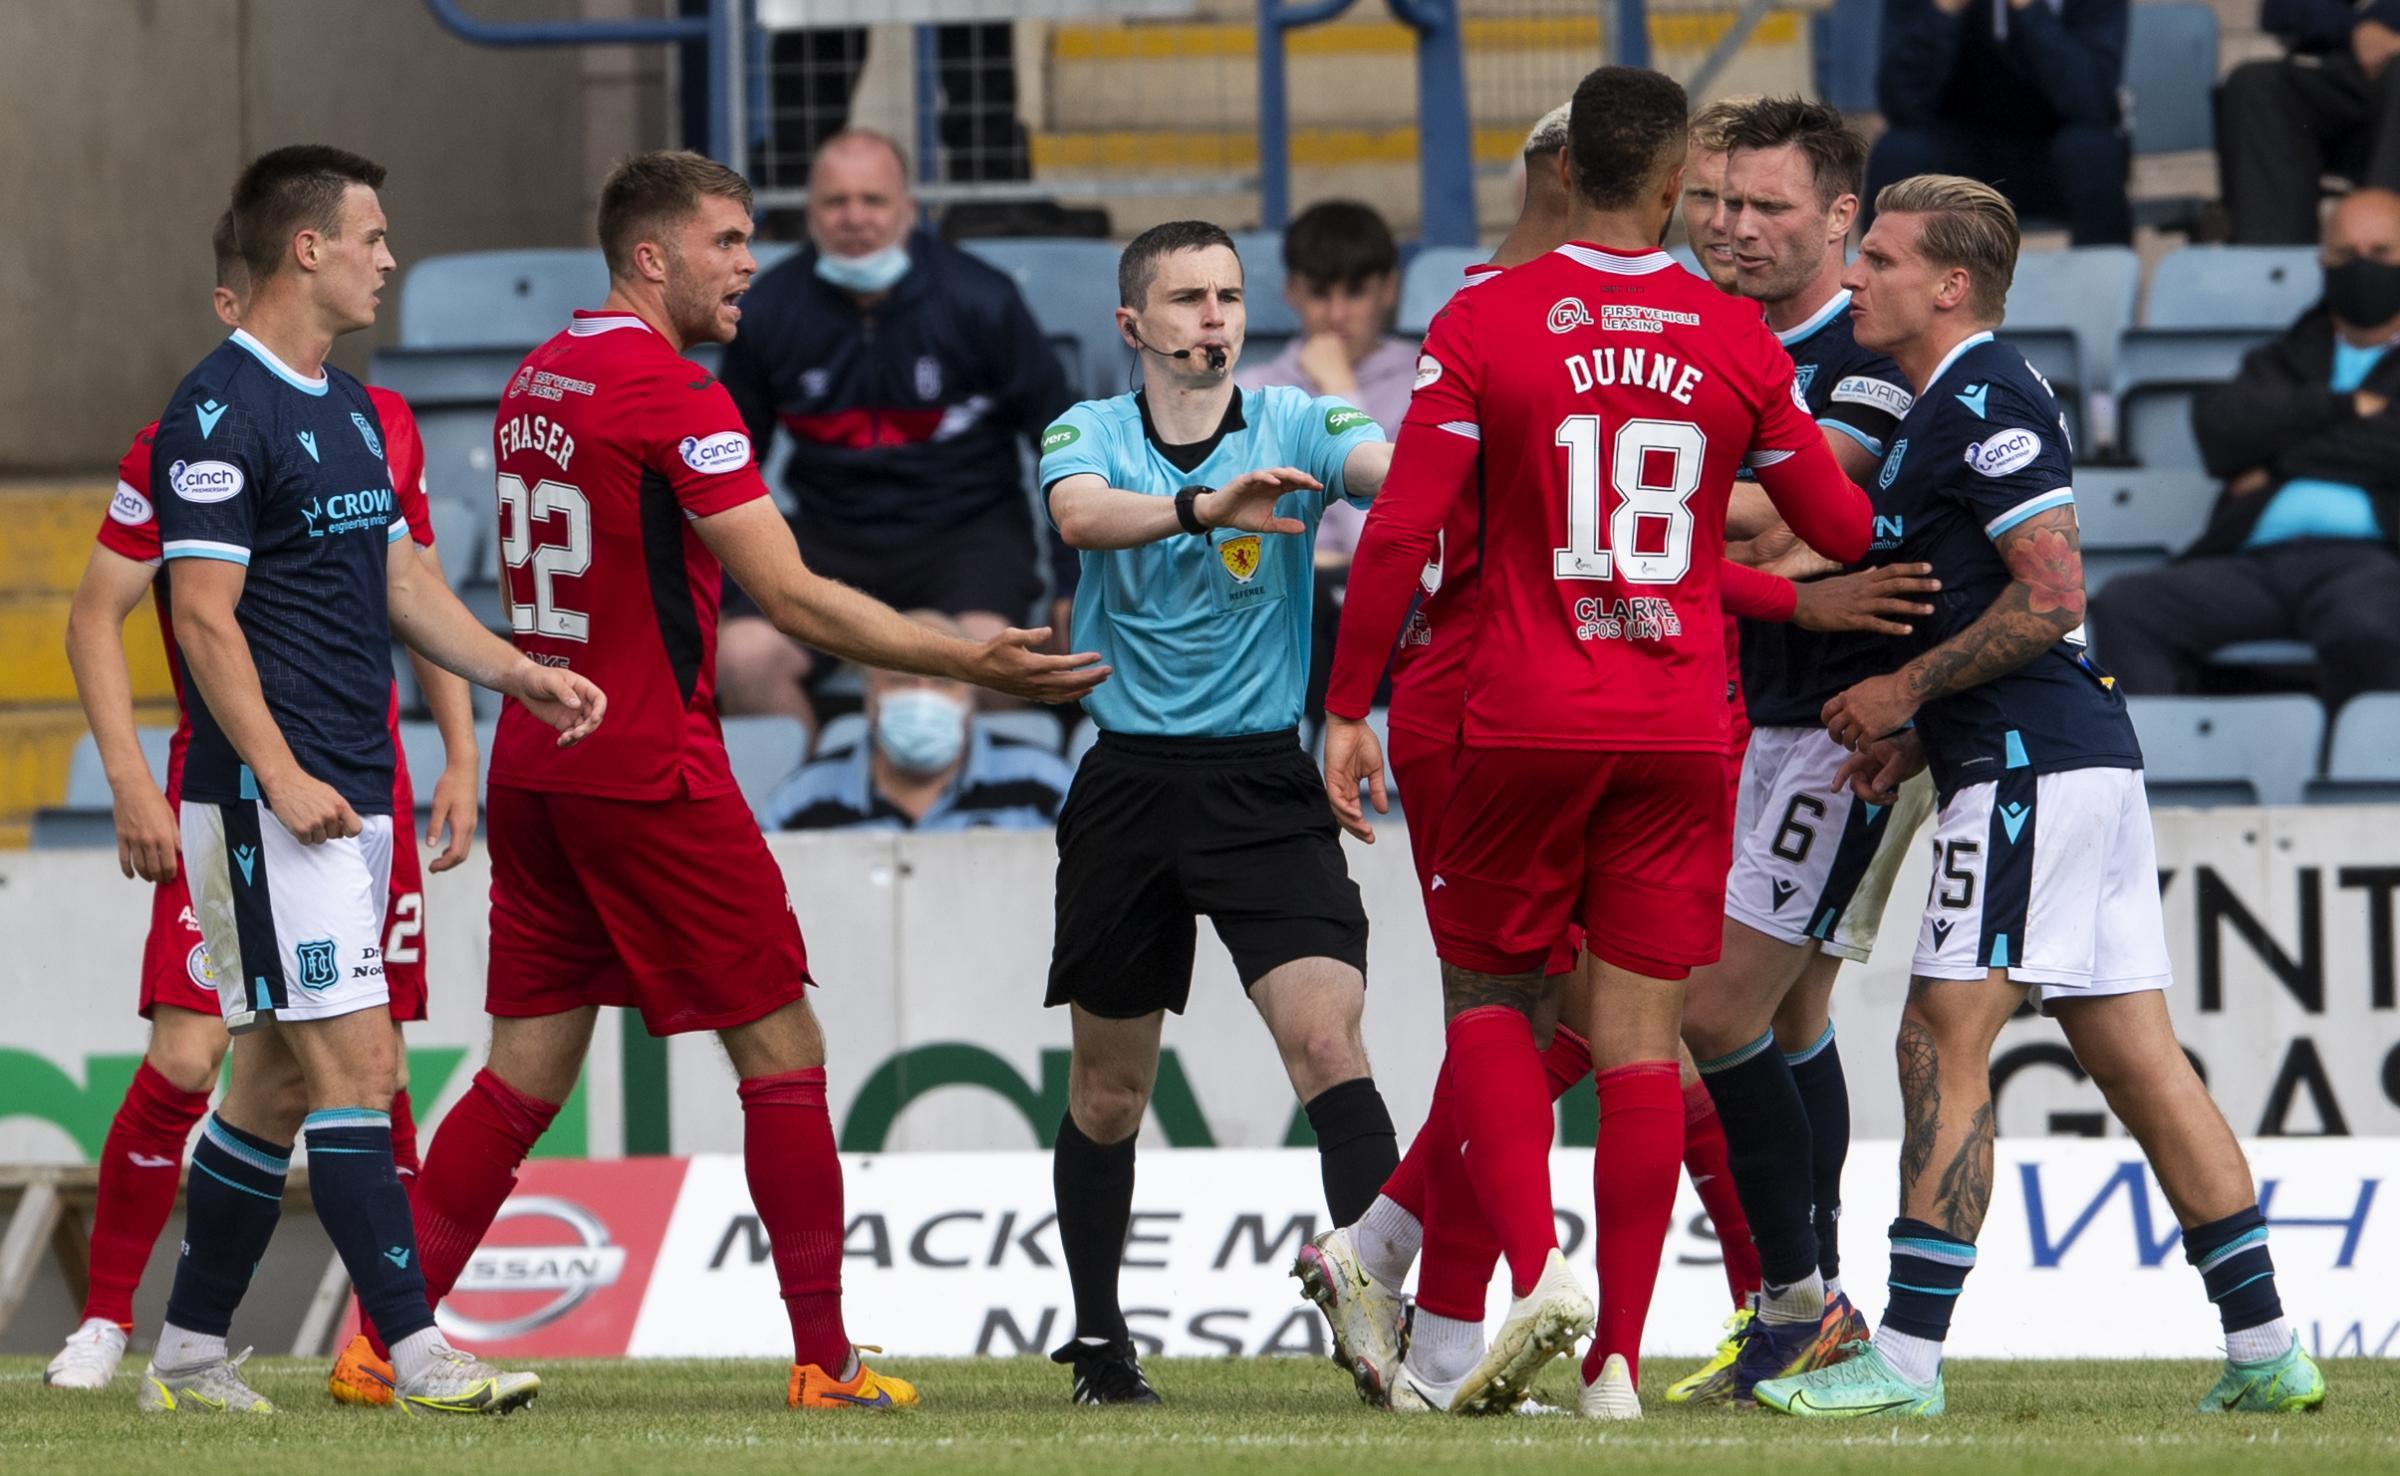 Dundee 2-2 St Mirren: James McPake proud as Dark Blues fight back on top-flight return